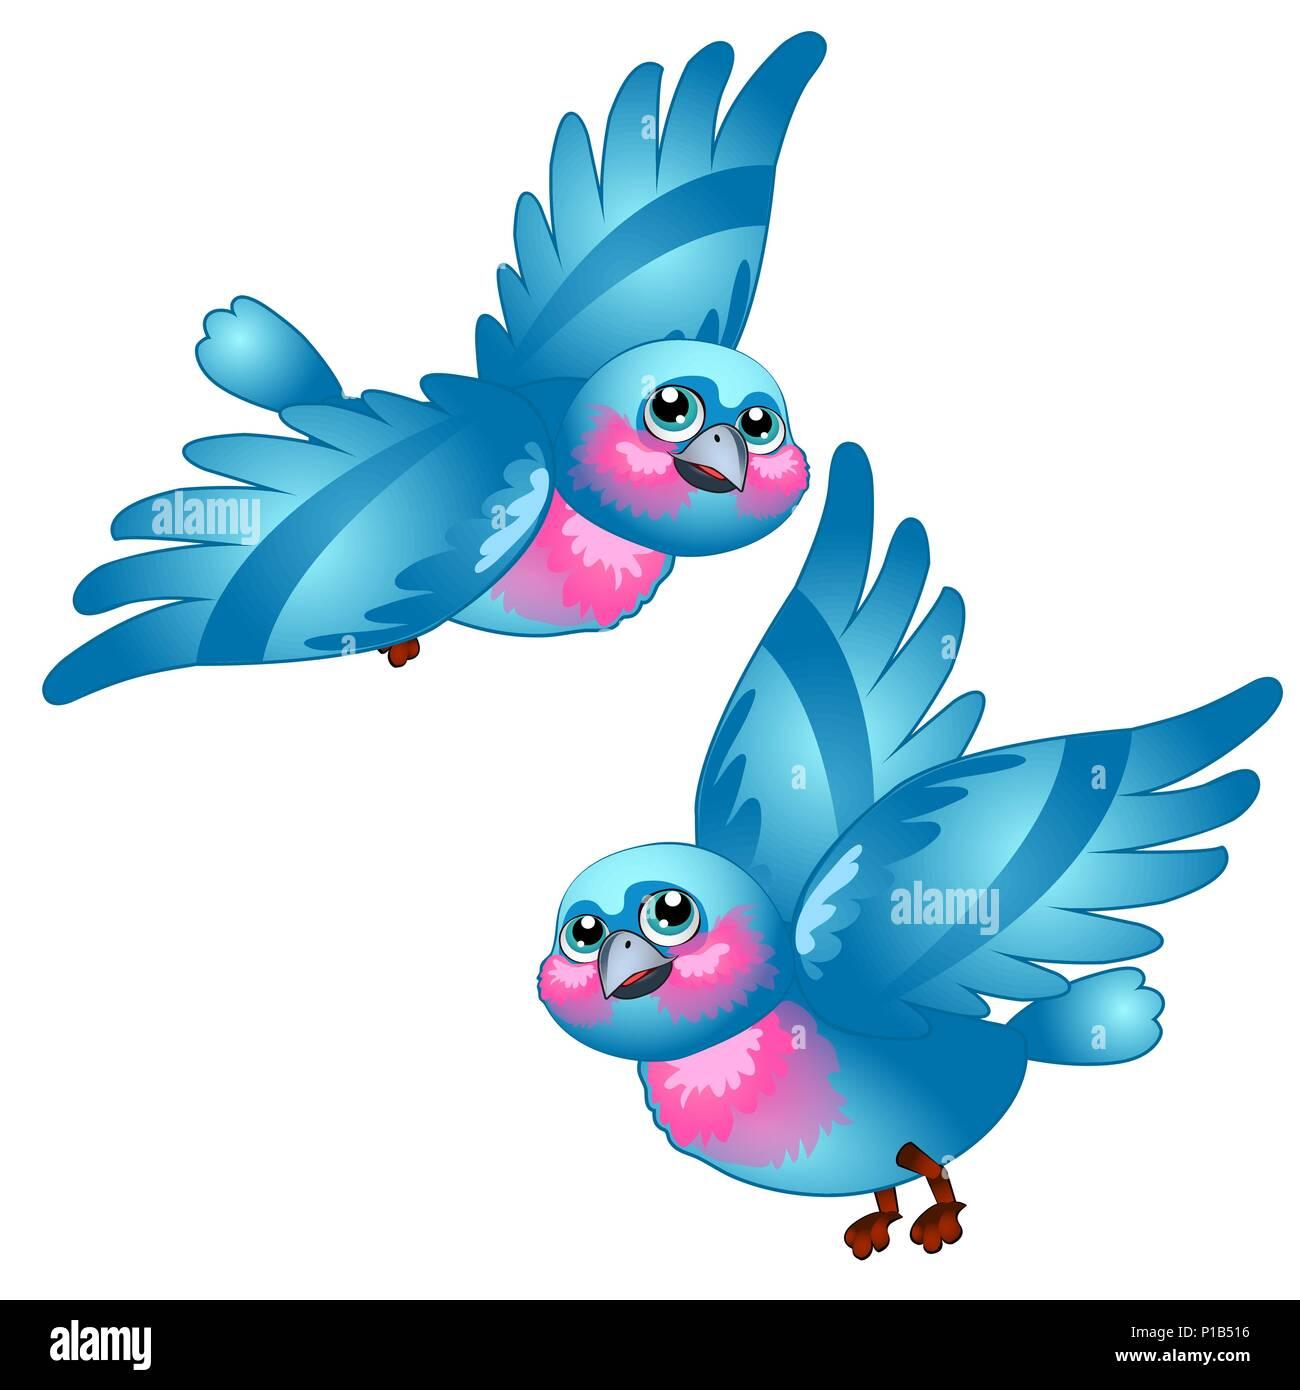 Funny cartoon blue bird isolated on white background. Vector cartoon close-up illustration. - Stock Vector